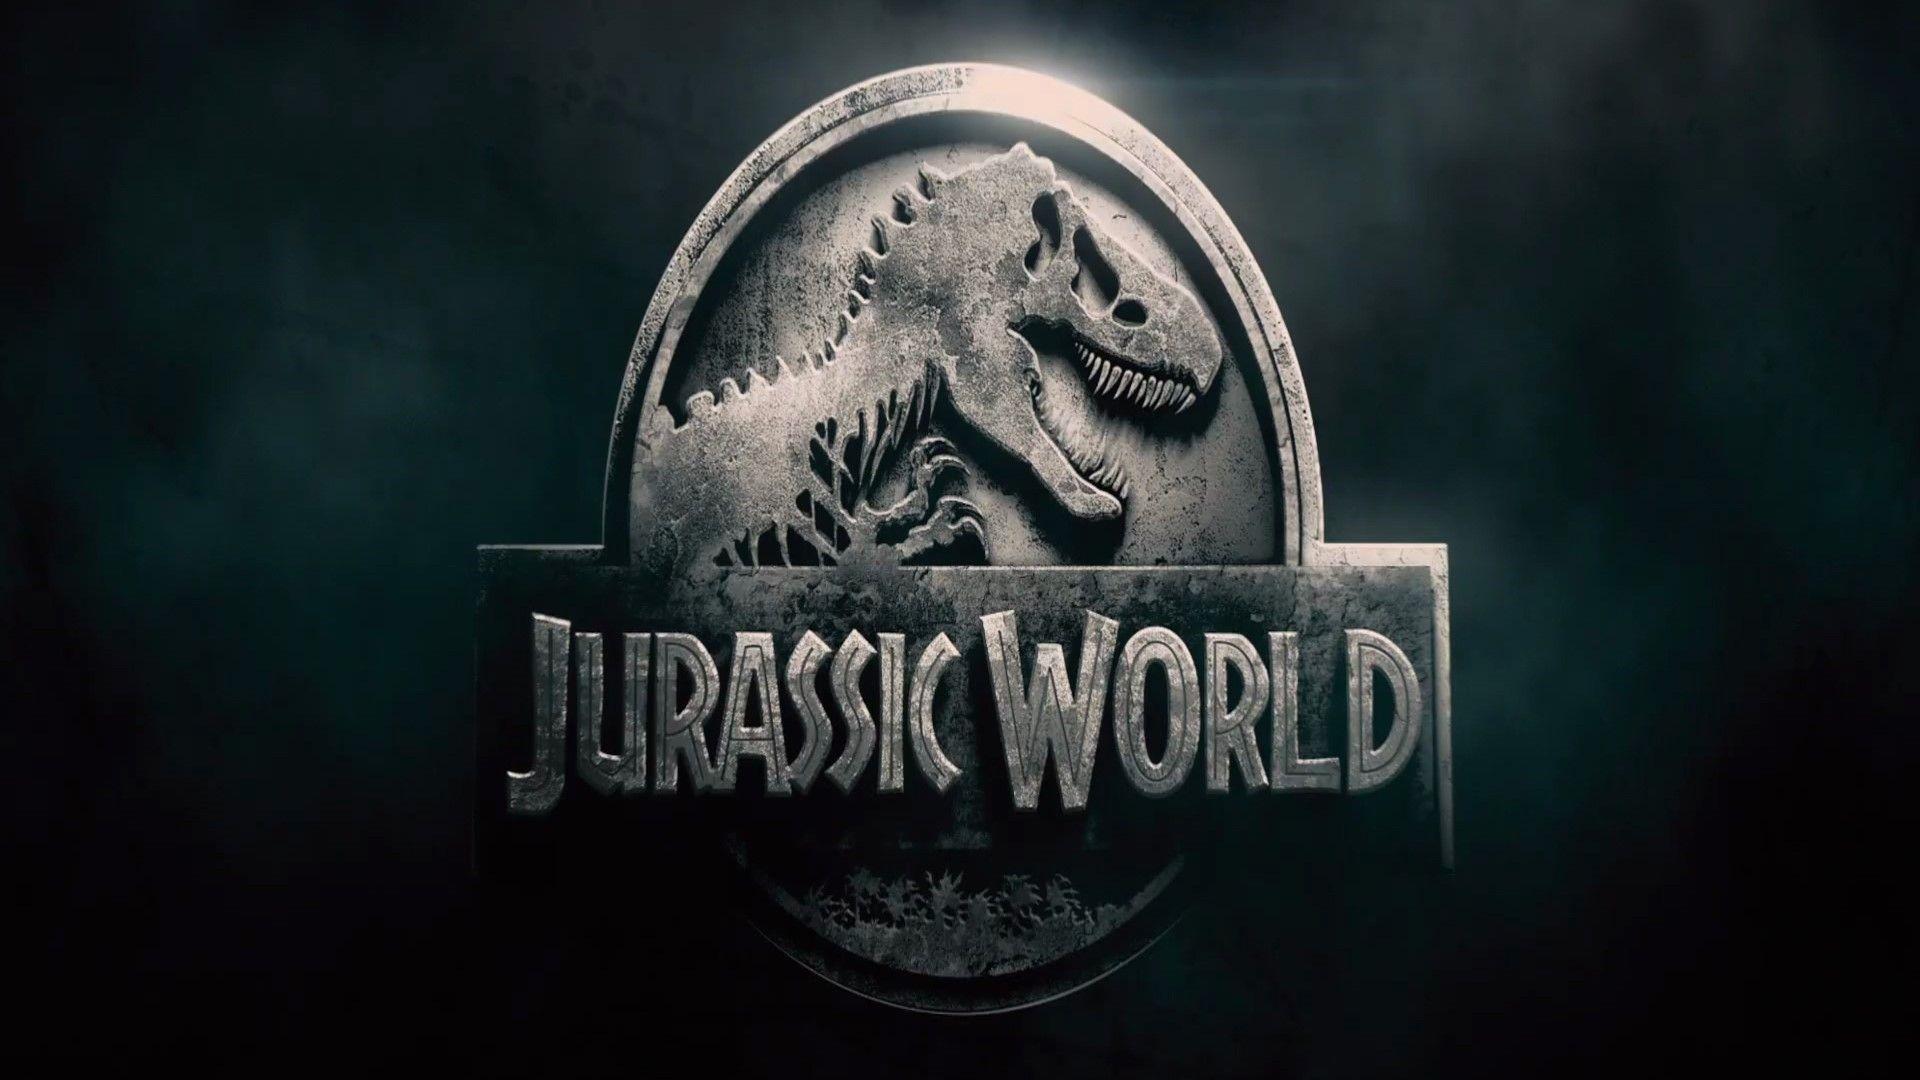 Full Hd Wallpaper Jurassic World Logo Background, Desktop Backgrounds Hd